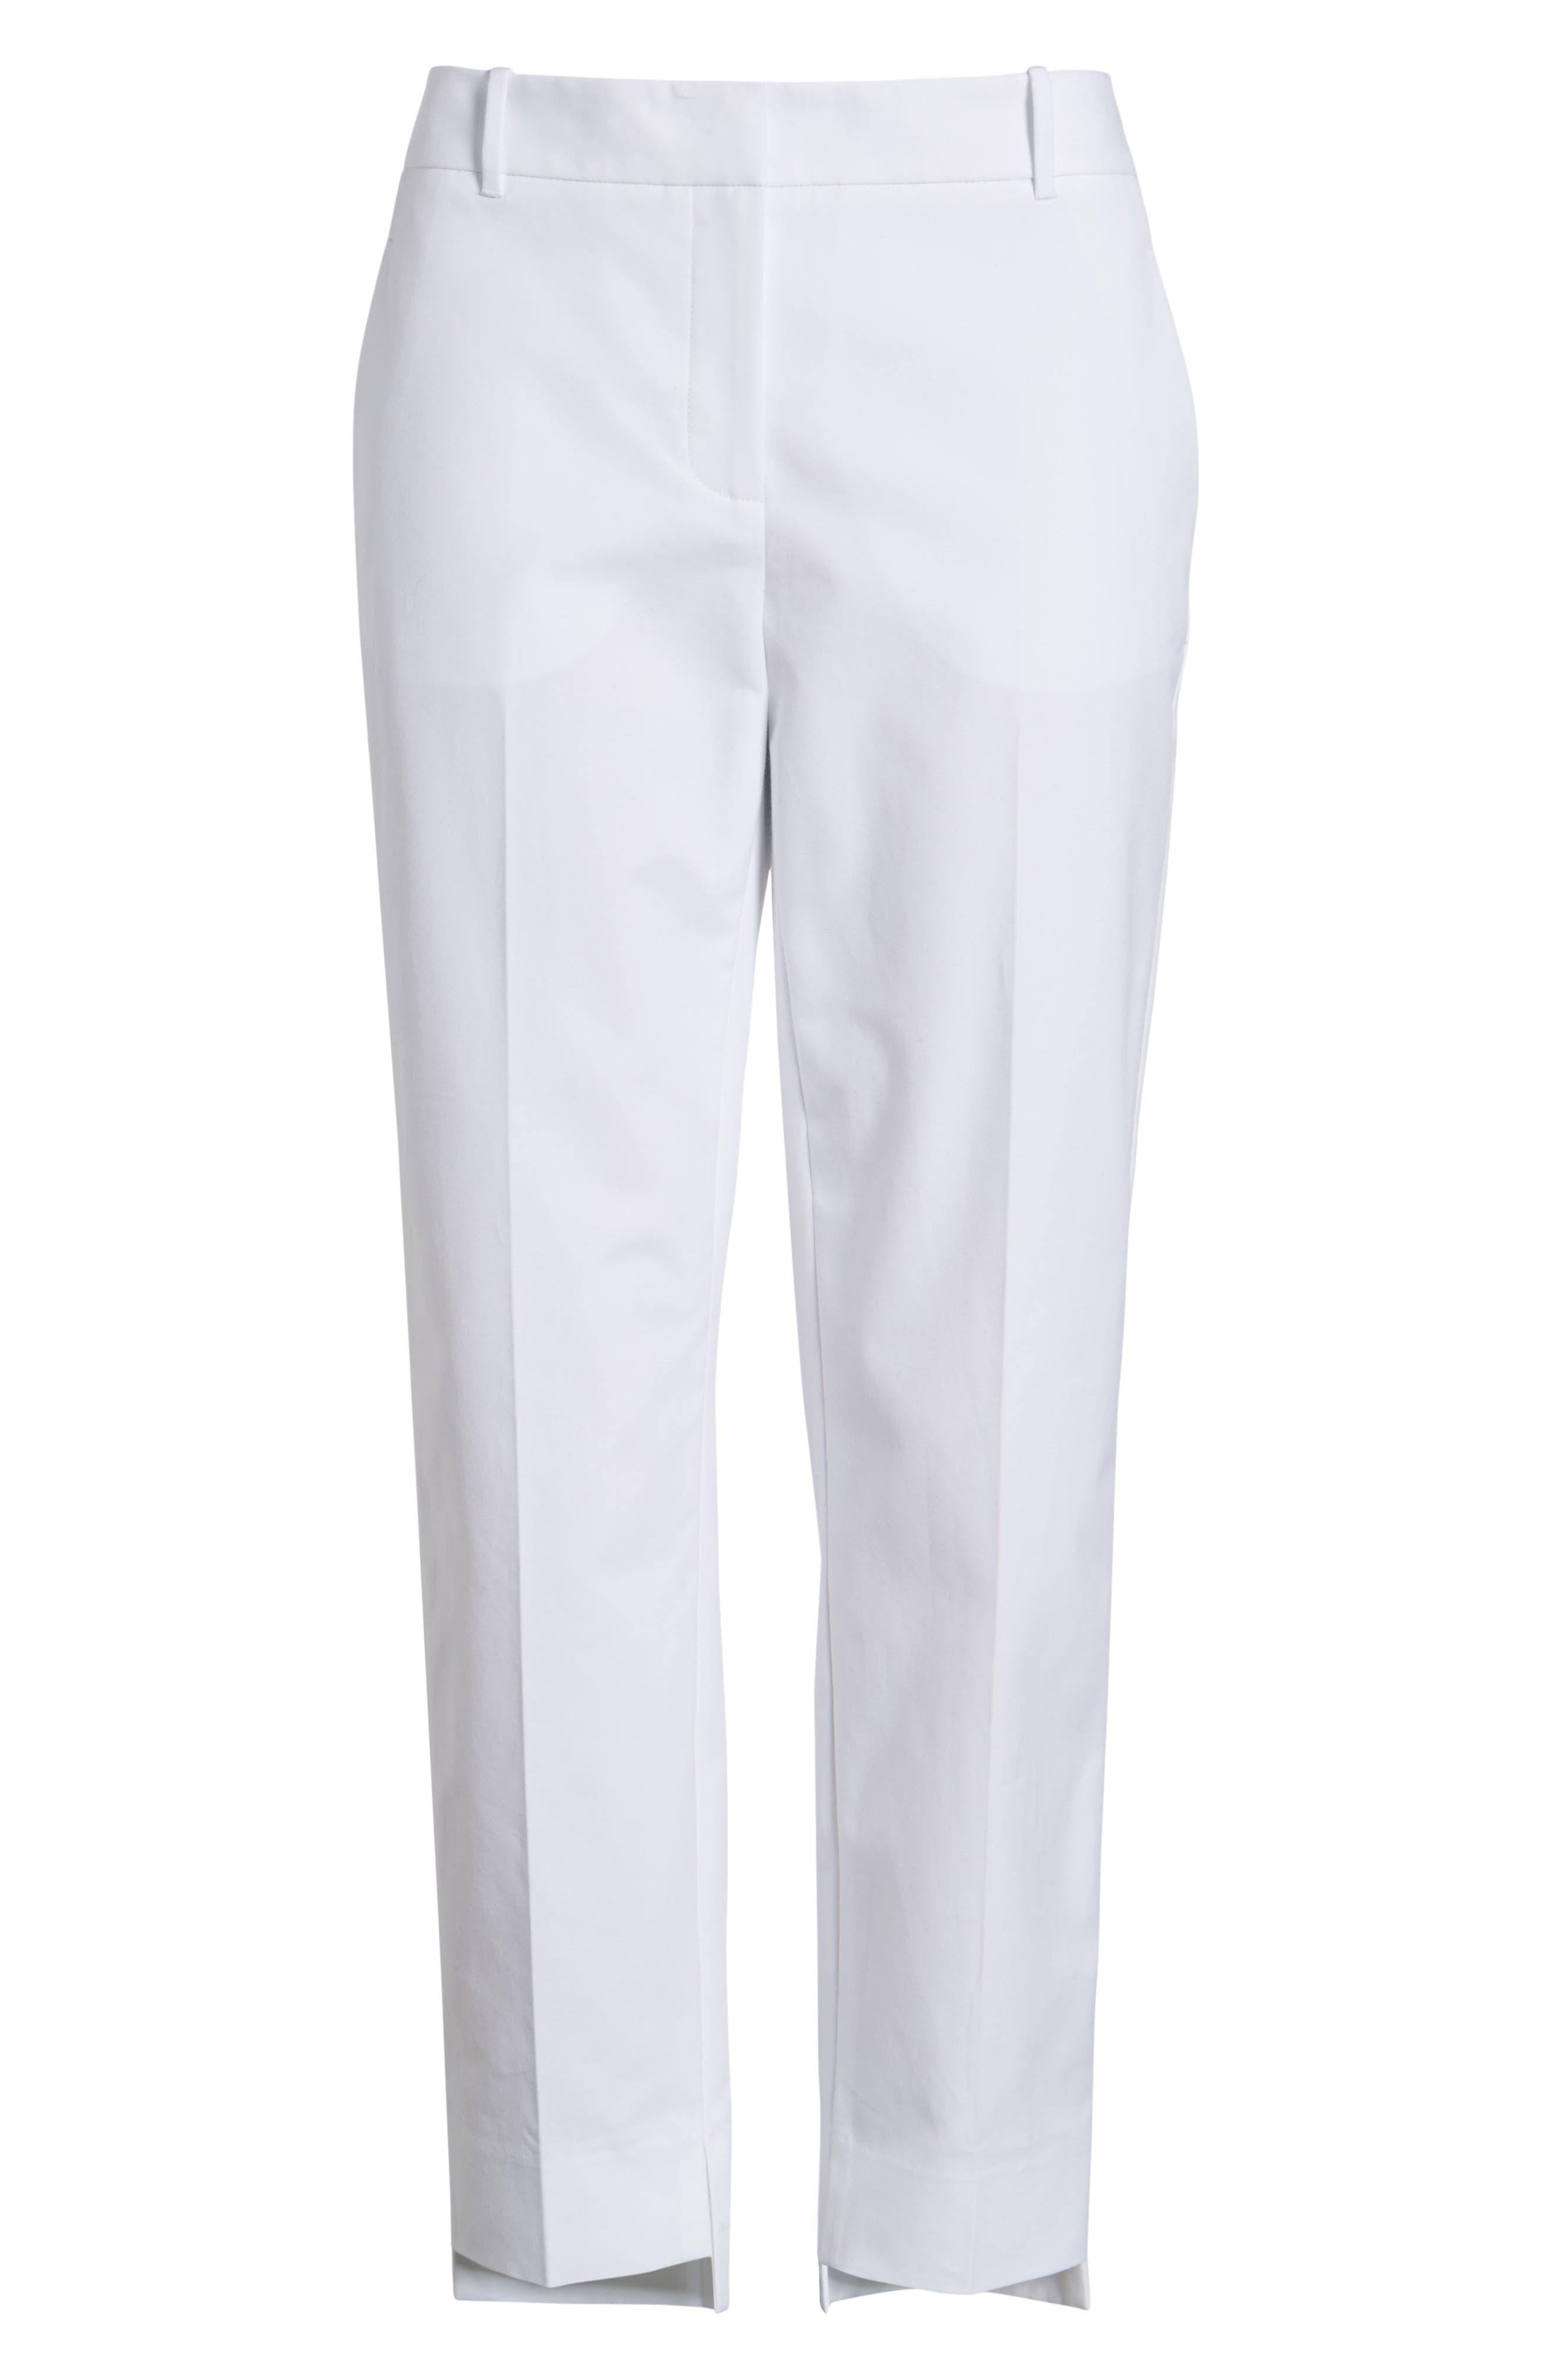 High/Low Crop Pants,                             Alternate thumbnail 12, color,